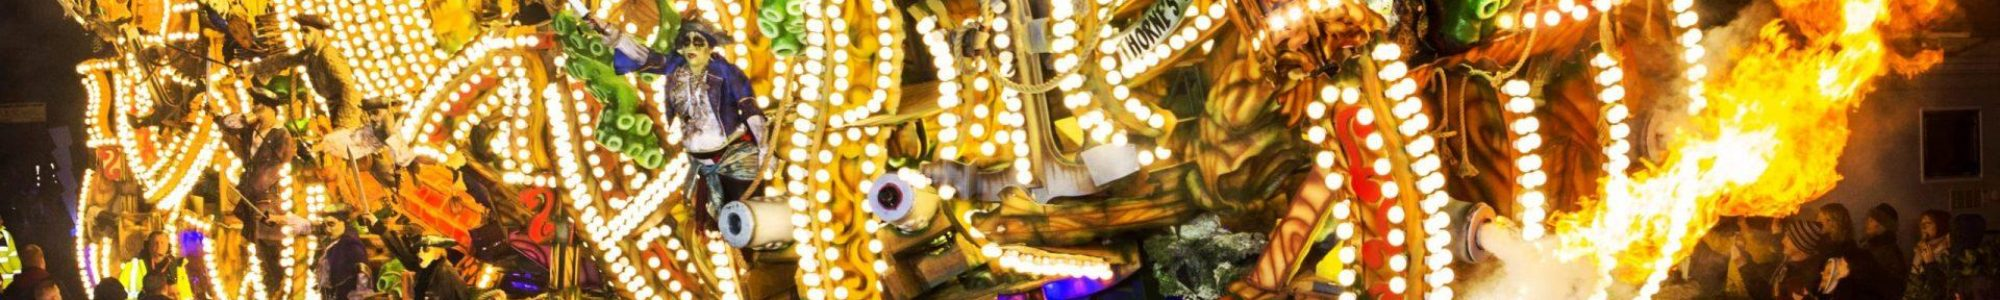 1-Bridgwater-Carnival-2019-Gremlins-min-scaled